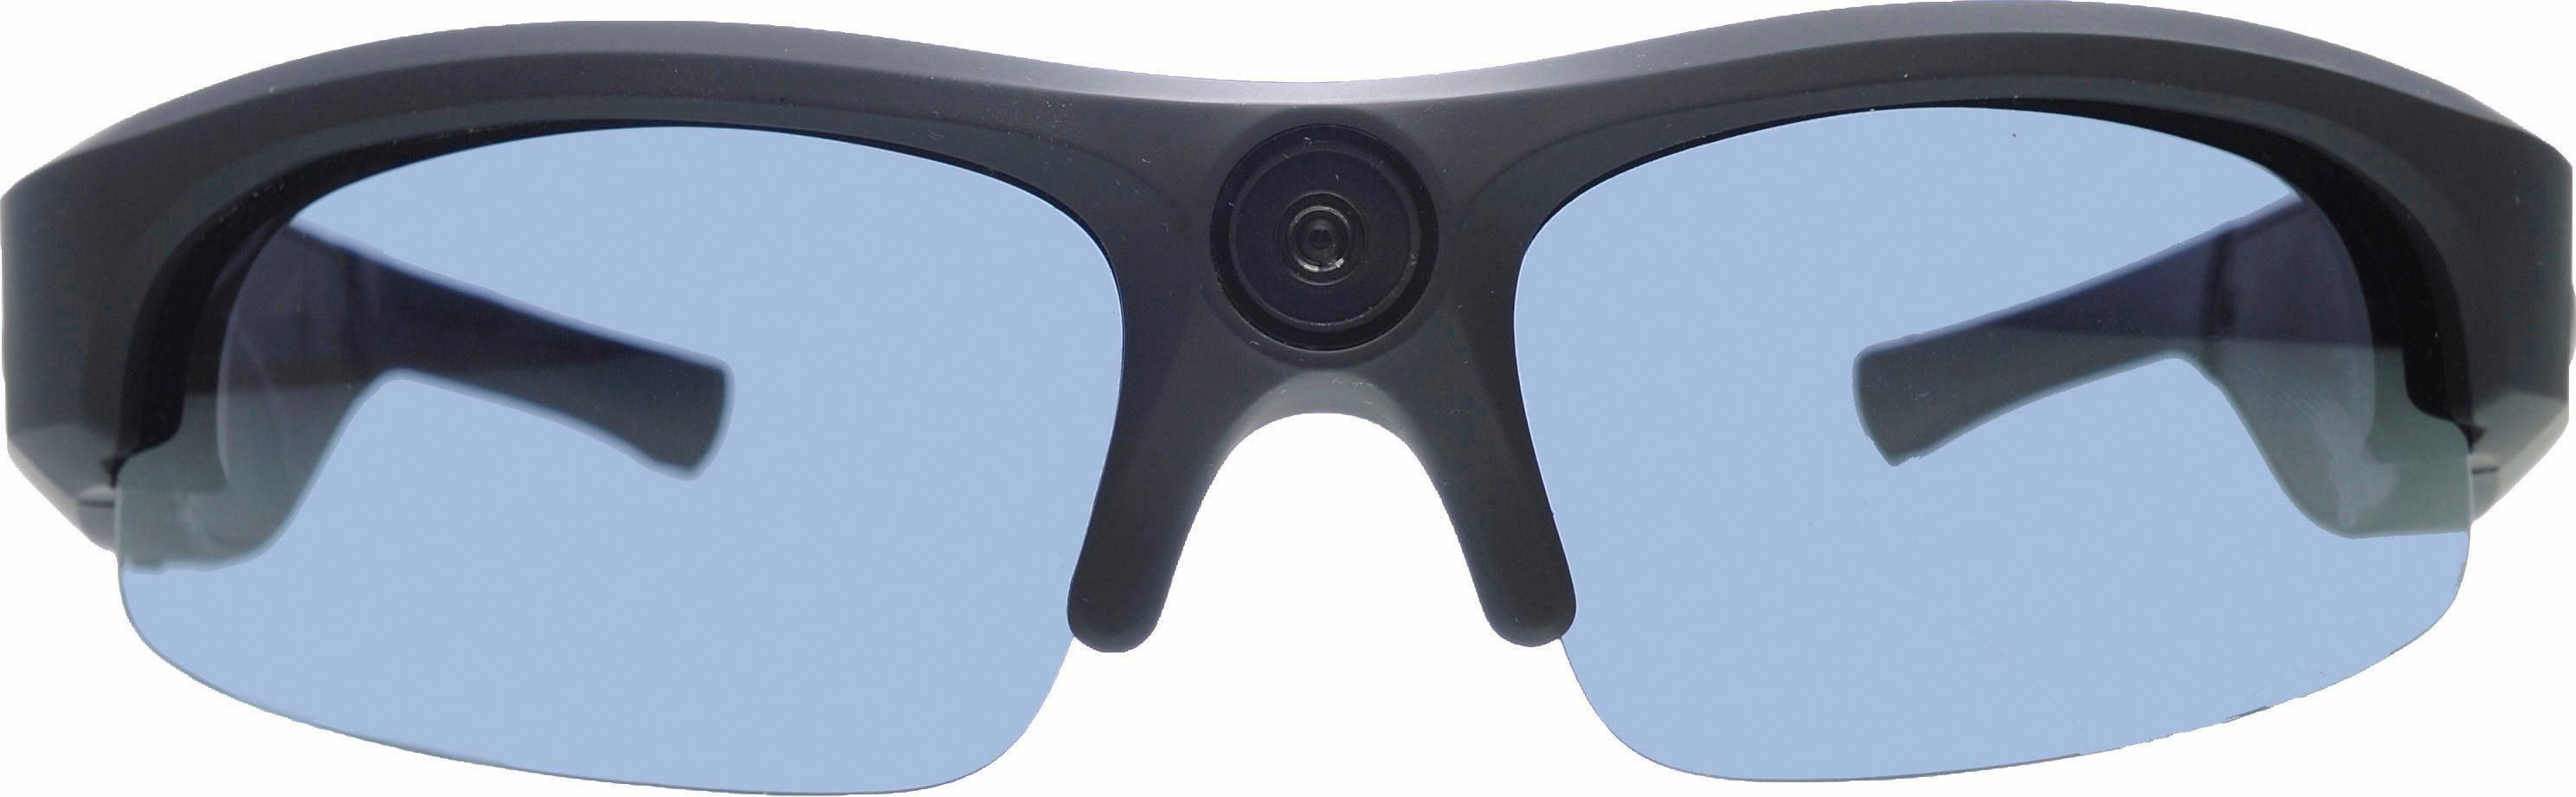 Rollei Sunglasses Cam 200 1080p (Full HD) Kamerabrille